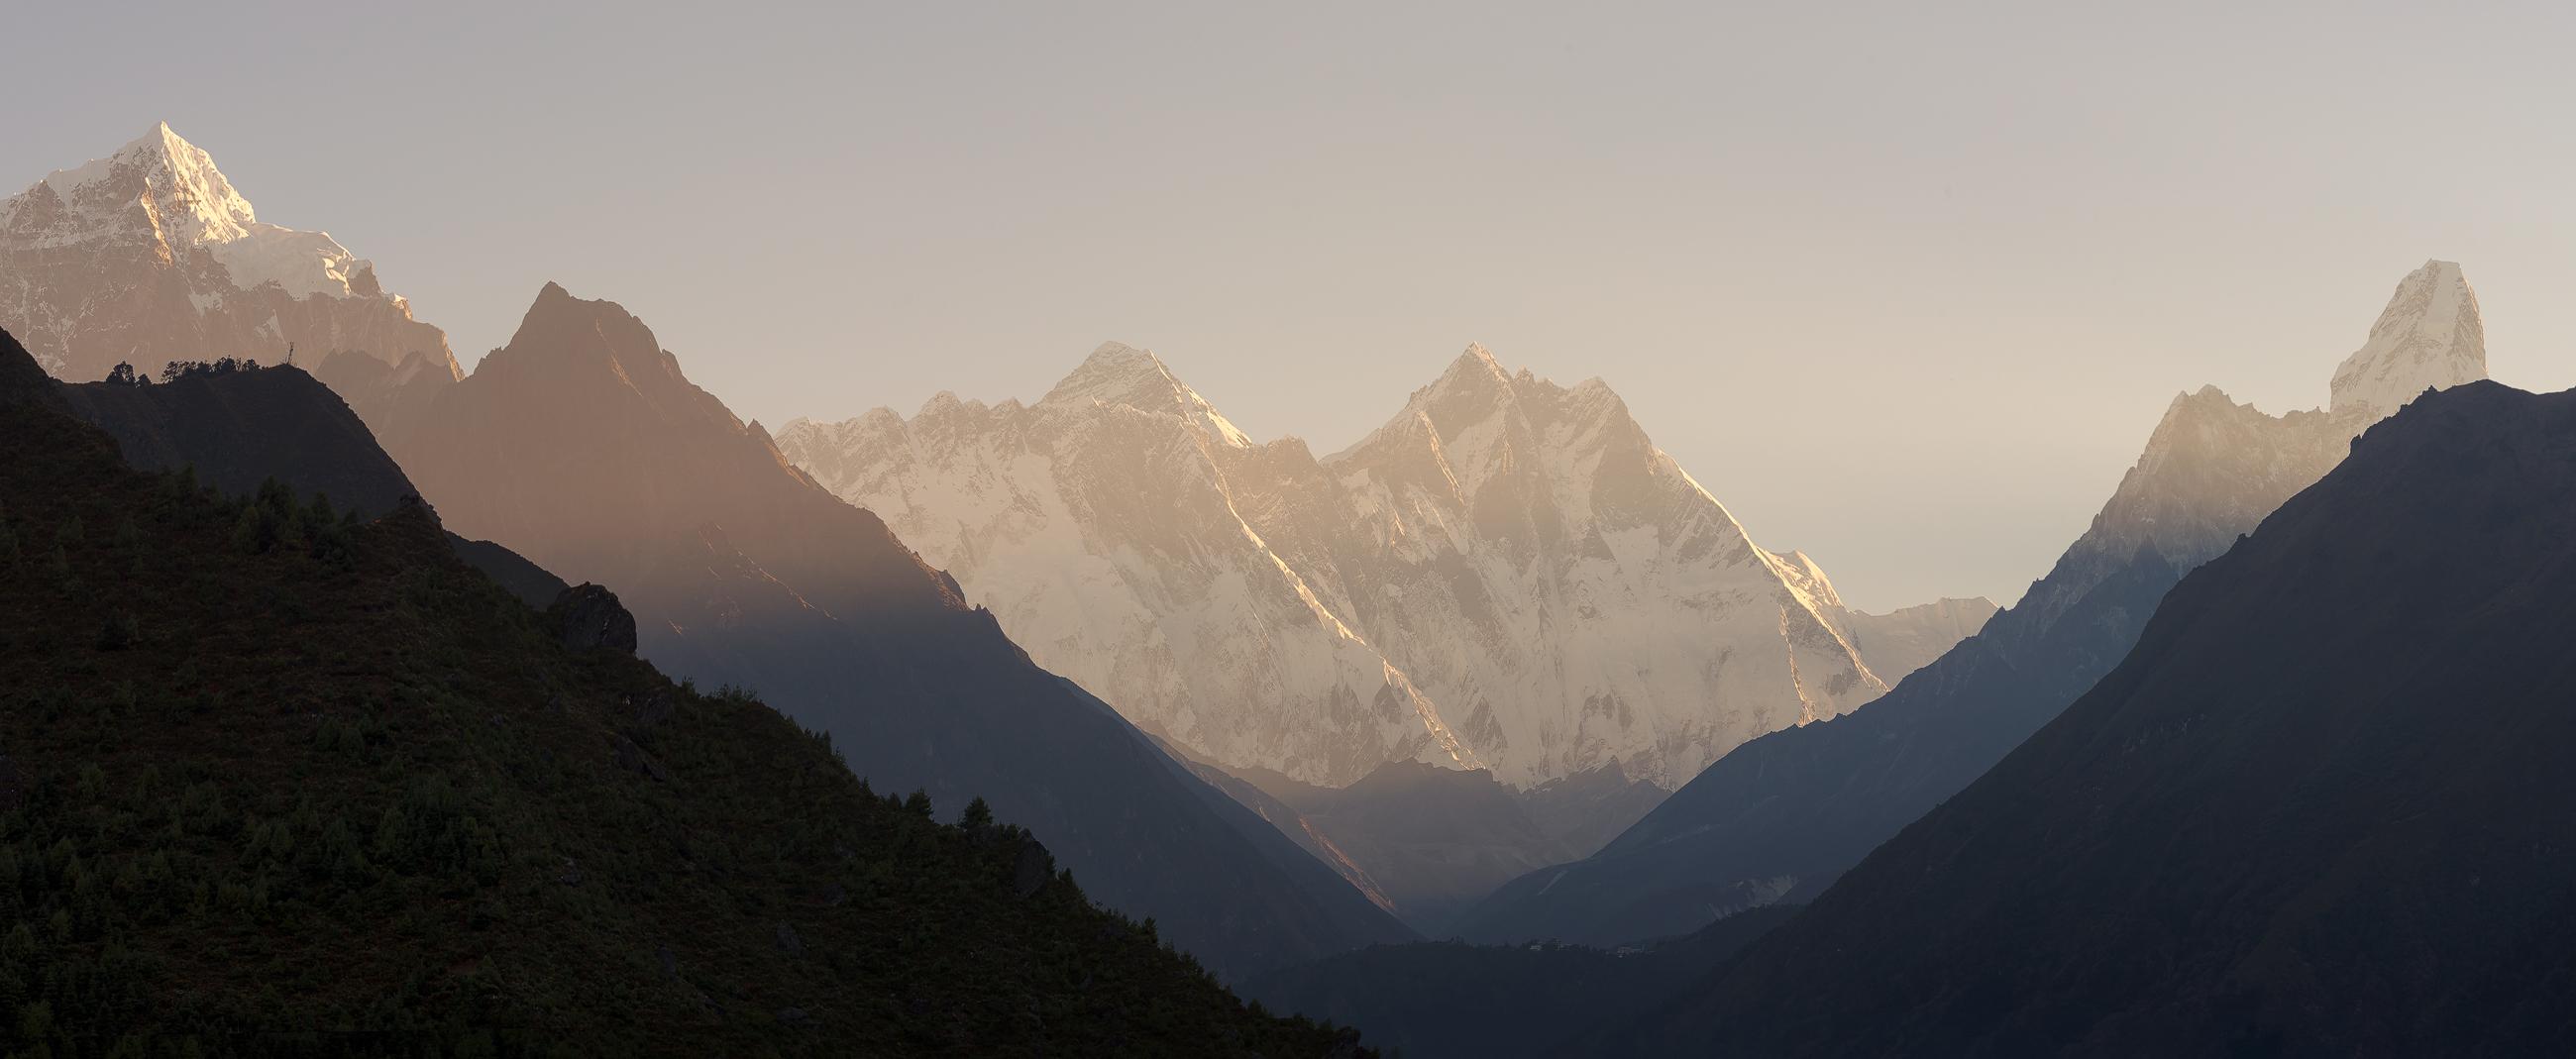 Nepal - Valle del Khumbu (Llotse, Ama Dablam y Everest)